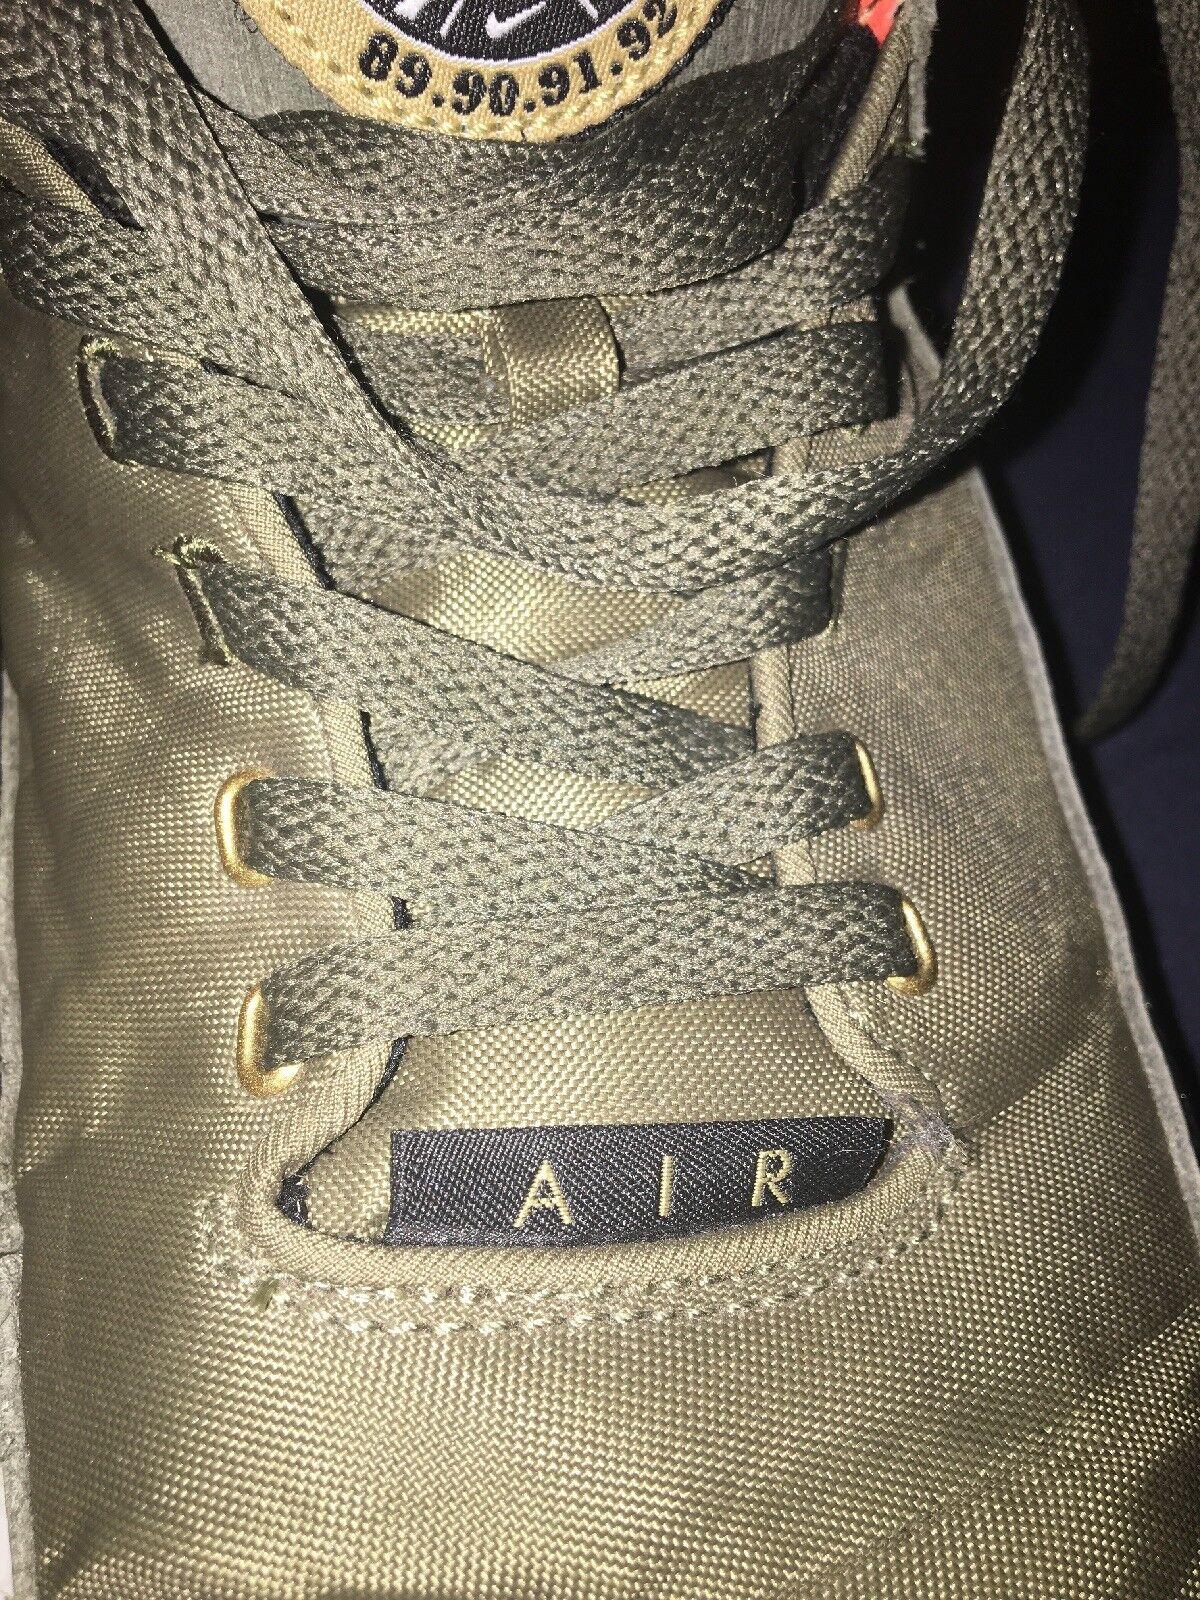 finest selection feead 23996 ... Nike 1315 Flight Flight Flight Squad 89.90.91.92 Mens shoes Sz 12 Olive  Green Used ...